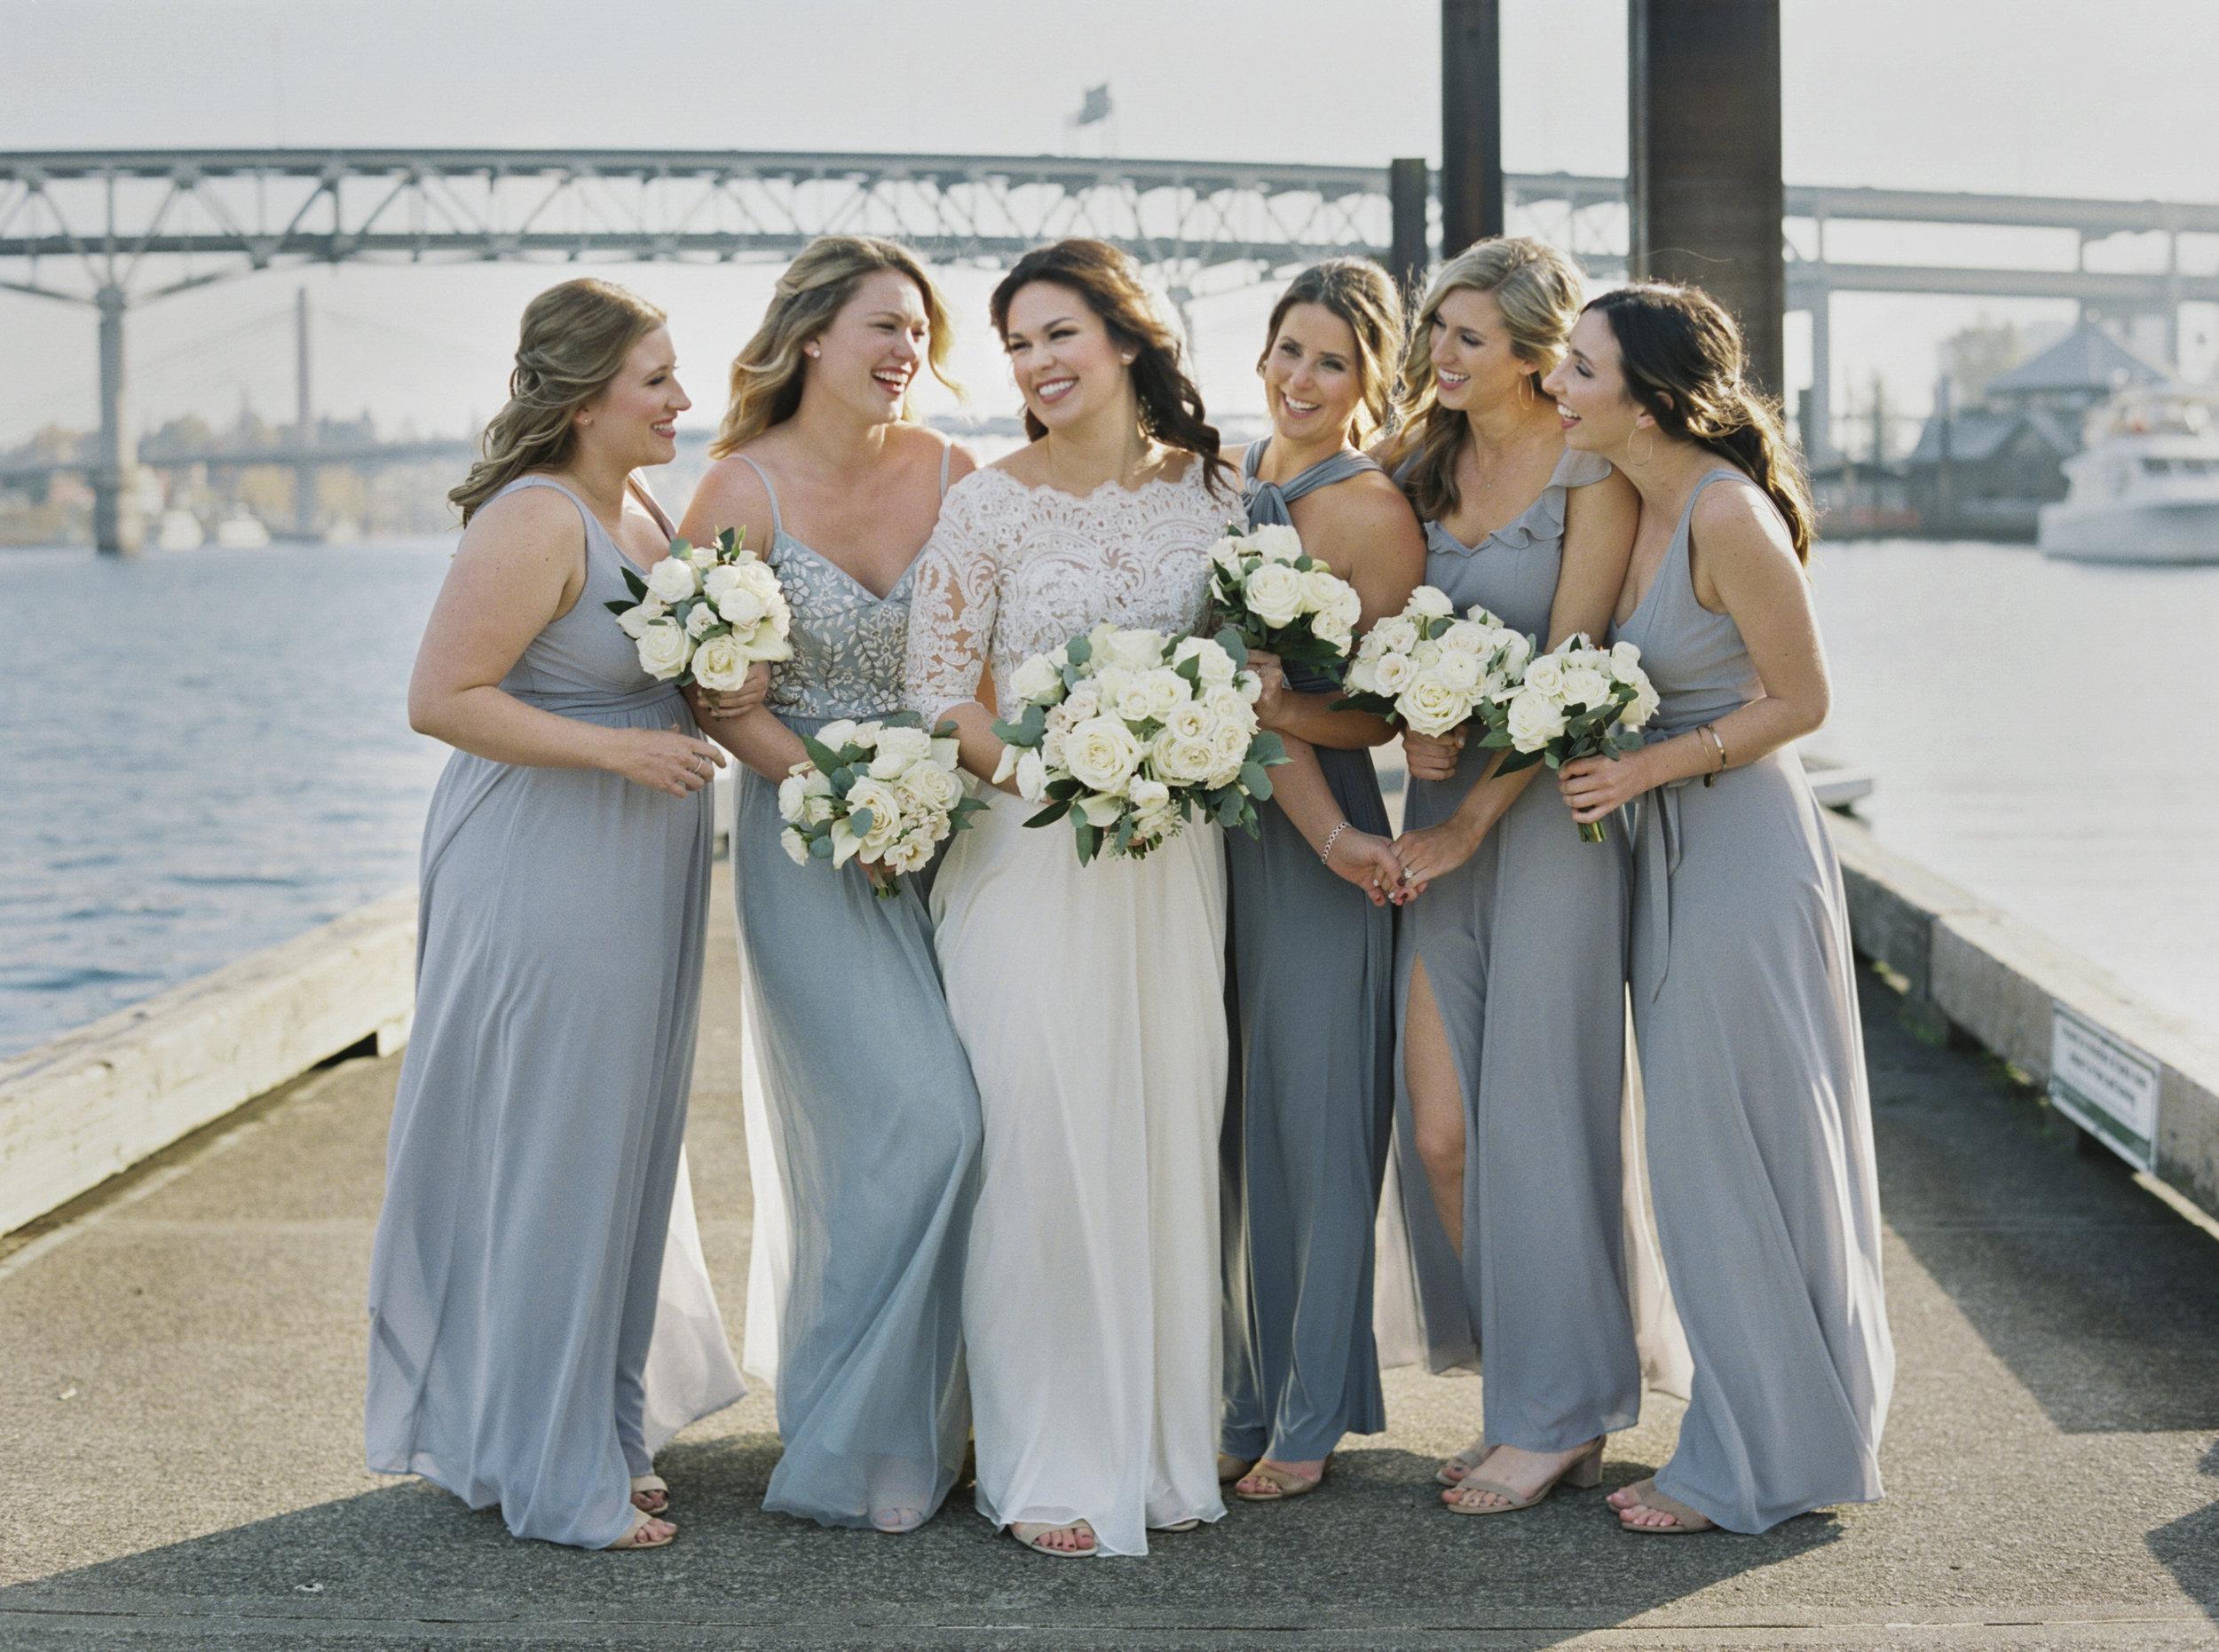 Castaway_Wedding_Photographer_Samantha&Garrett_067 copy.jpg